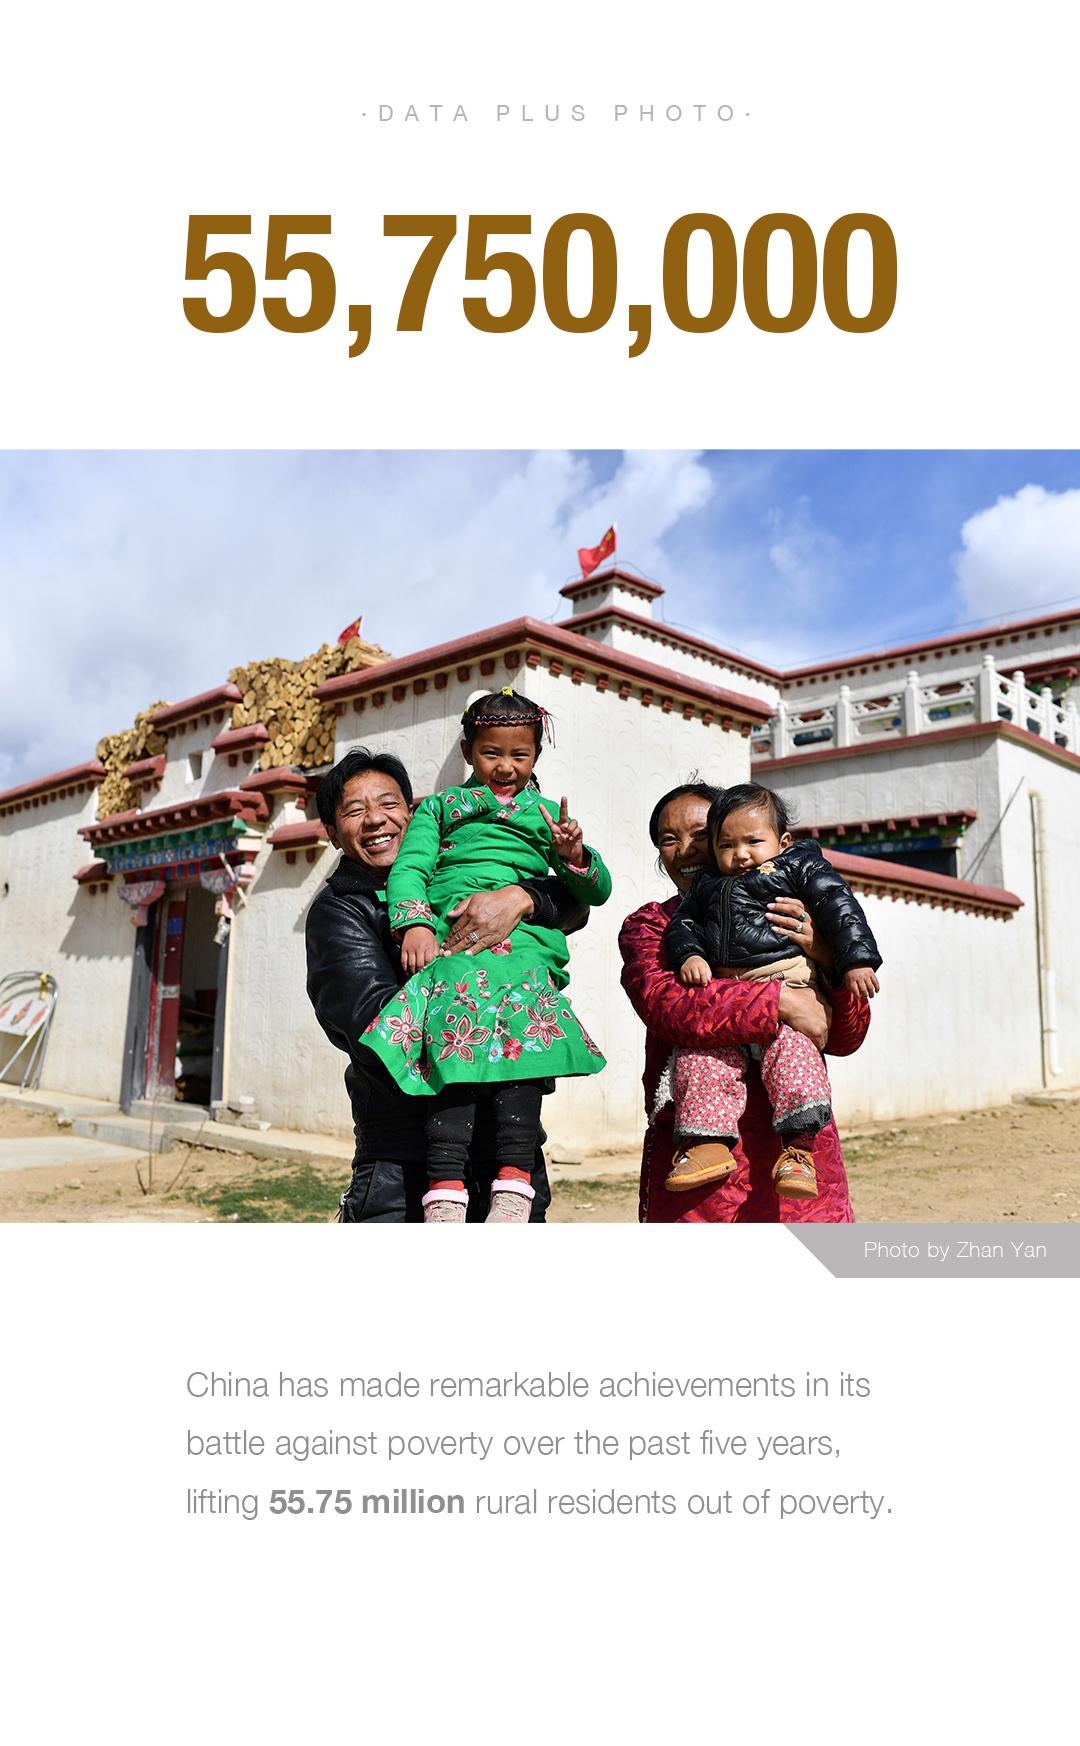 China's anti-poverty campaign in photo comparisons